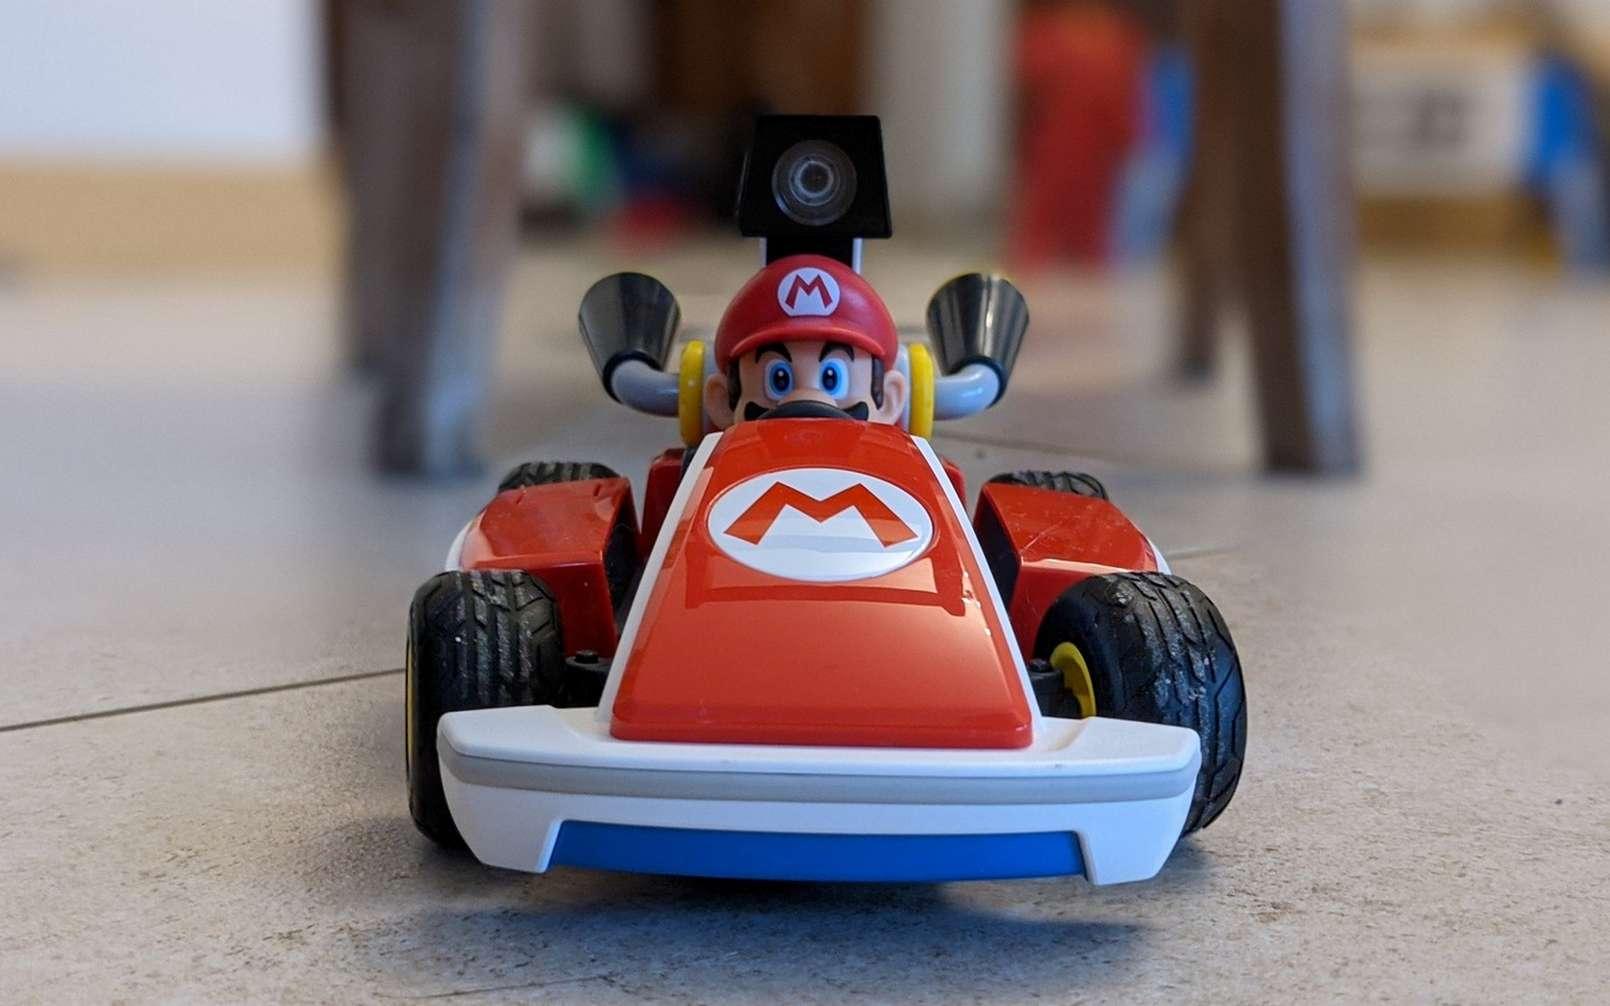 Mario Kart Live Home Circuit est disponible en version Mario ou Luigi pour 100 euros. © Marc Zaffagni